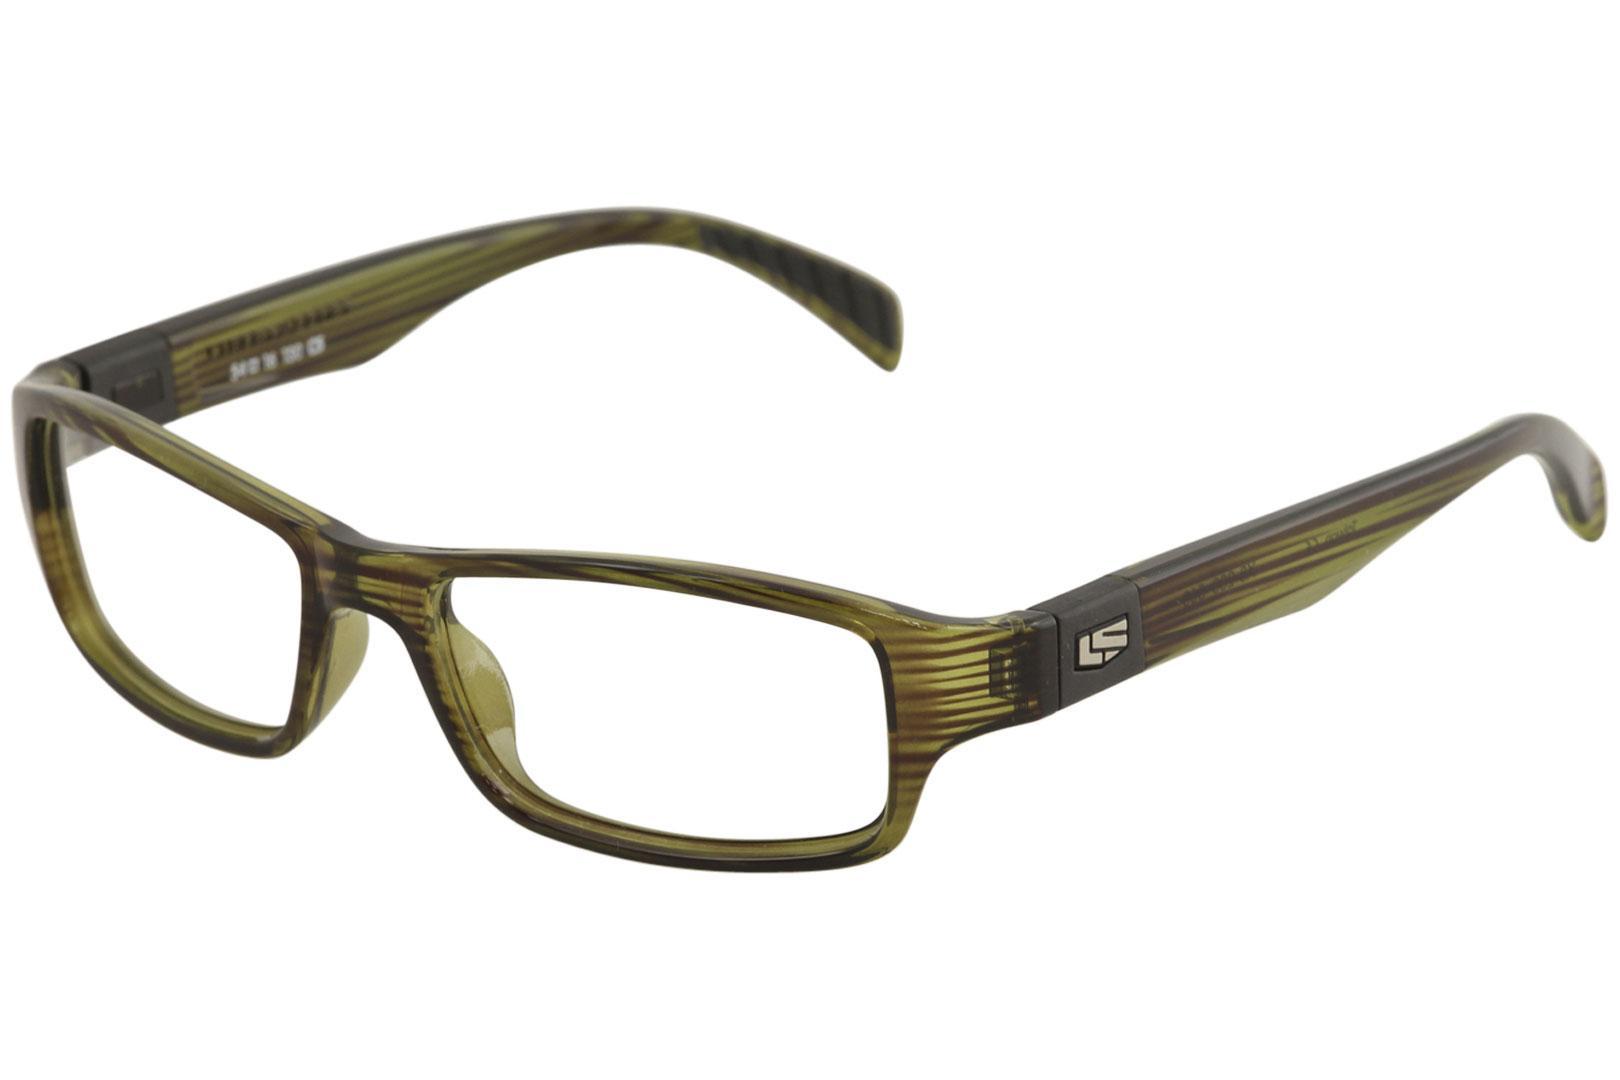 Image of Liberty Sport Men's Eyeglasses X8 200 Full Rim Optical Frame - Transparent Olive/Black Stripe   560 - Lens 54 Bridge 16 Temple 130mm